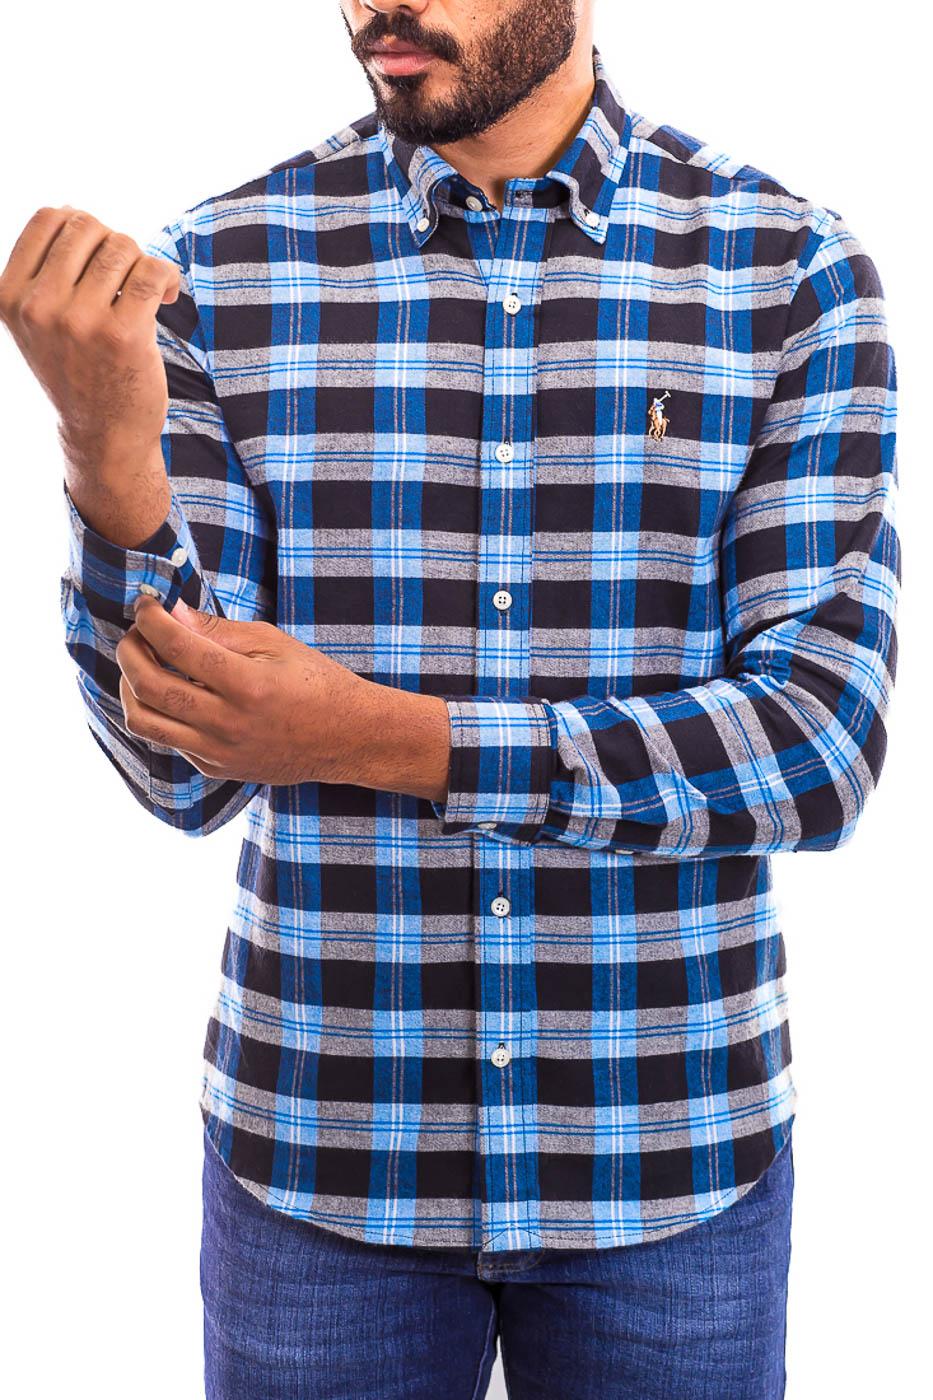 Camisa Ralph Lauren Masculina Flanelada Custom Fit Xadrez Logo Colored Azul e Preto